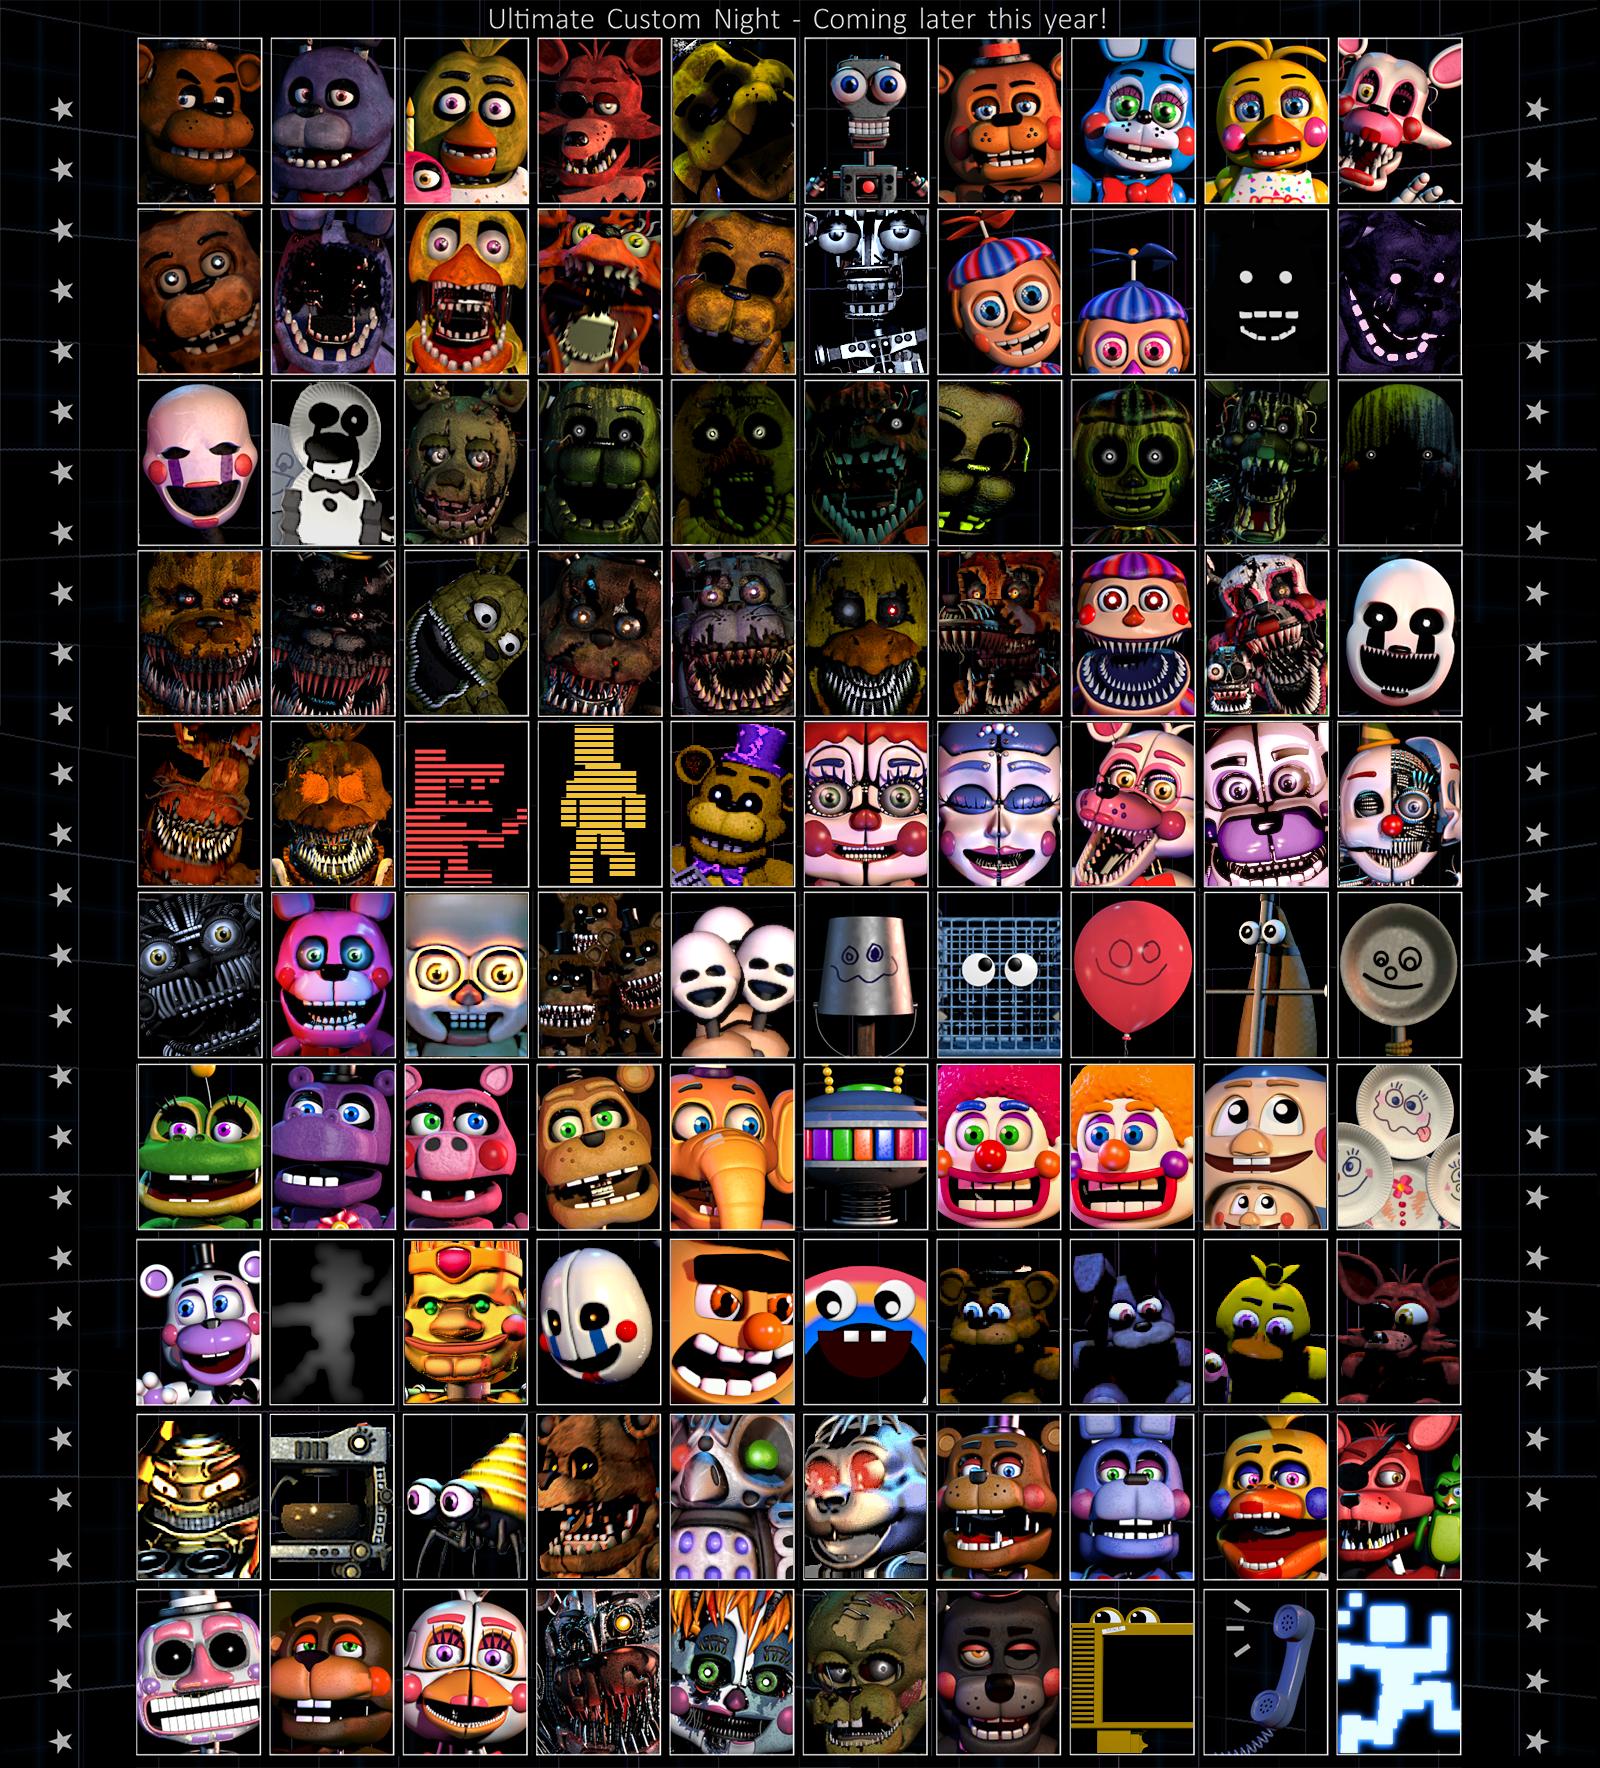 Image Result For Ultimate Custom Night